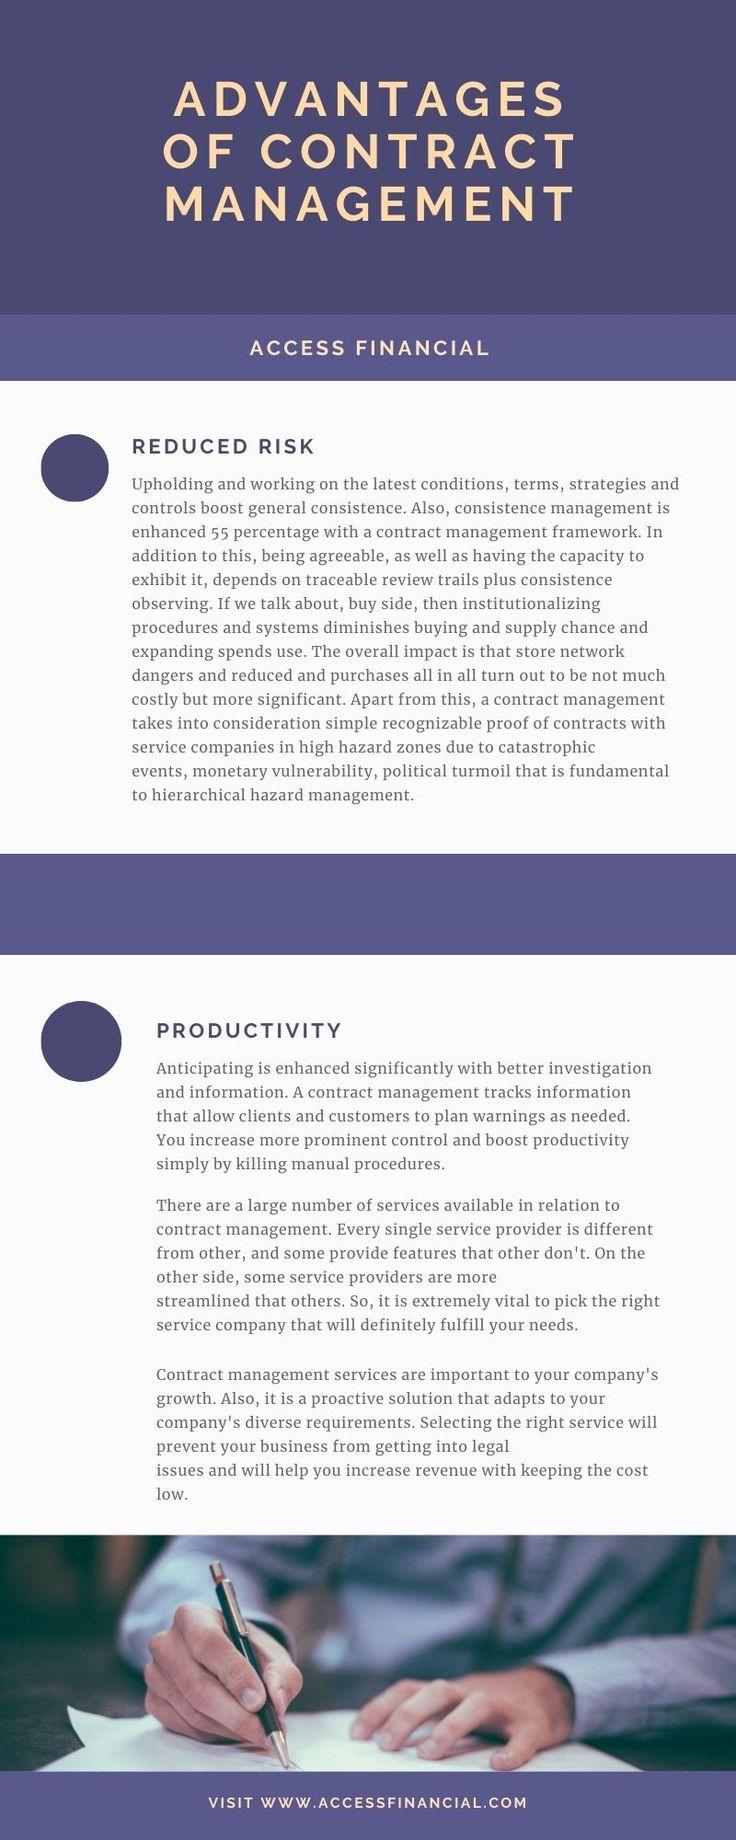 Advantages of contract management